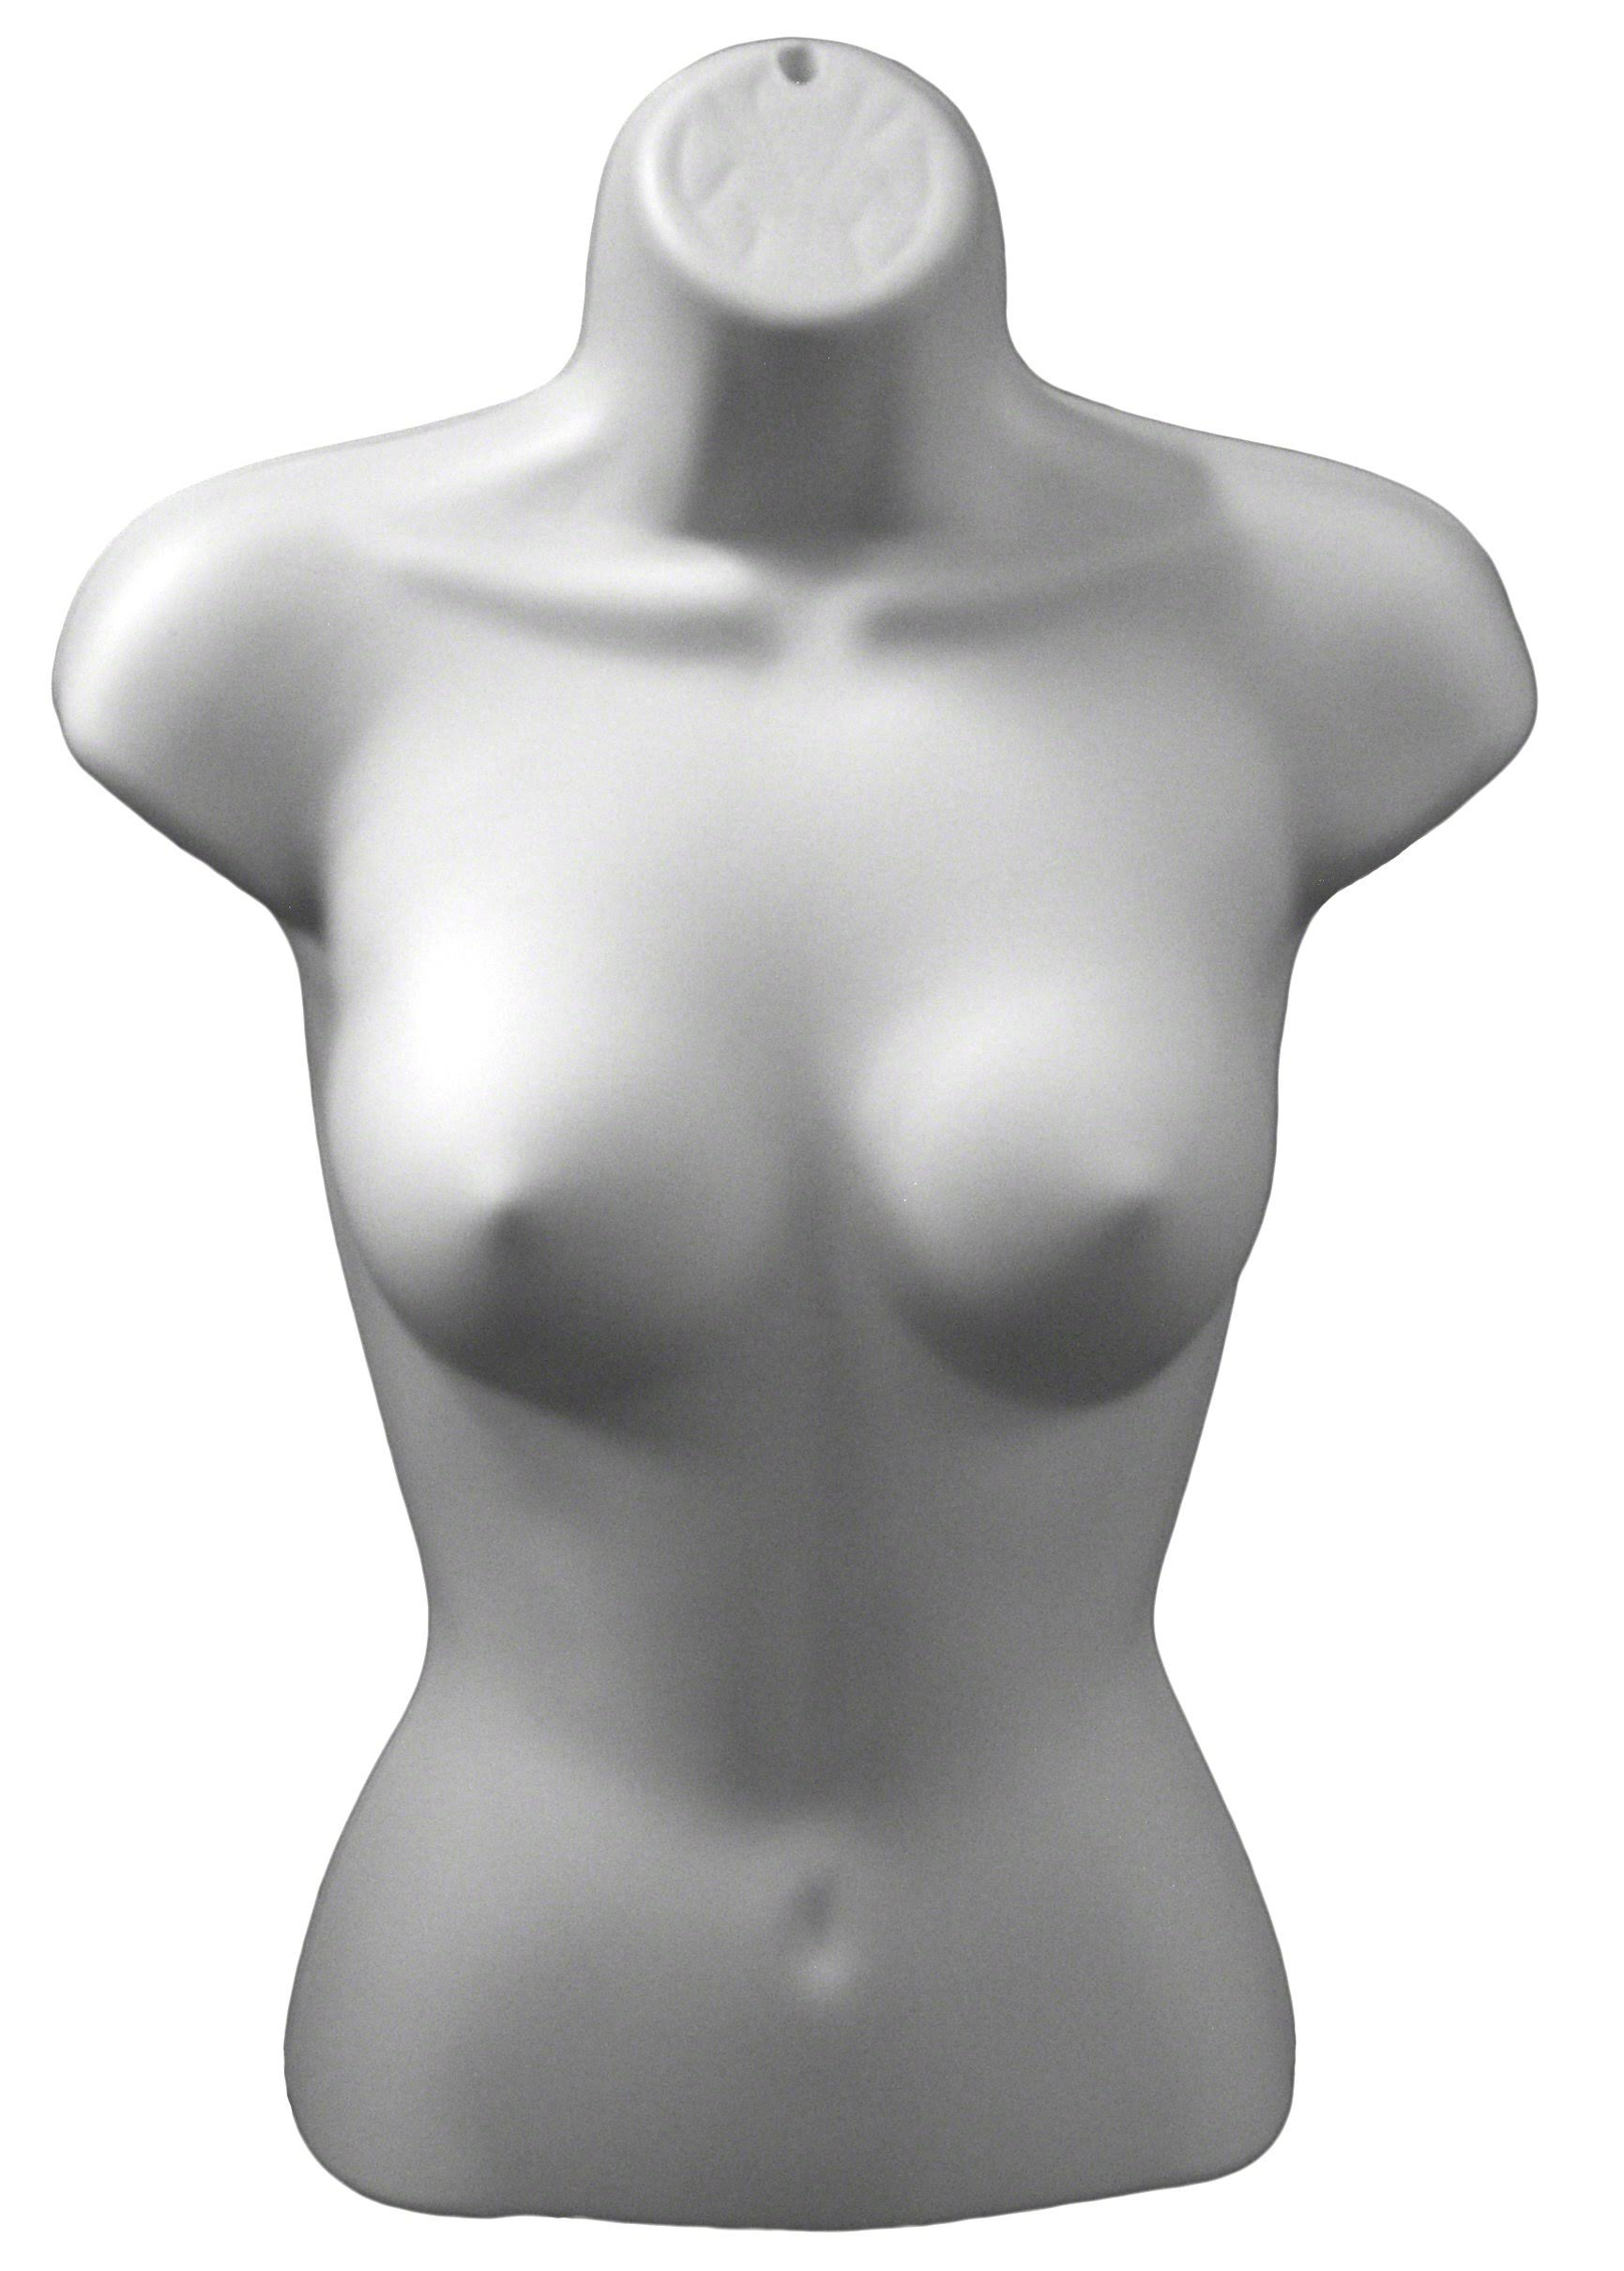 Blanco Torso Forma Plástico De Xs157w Maniquíes Femenino xaYpnqI